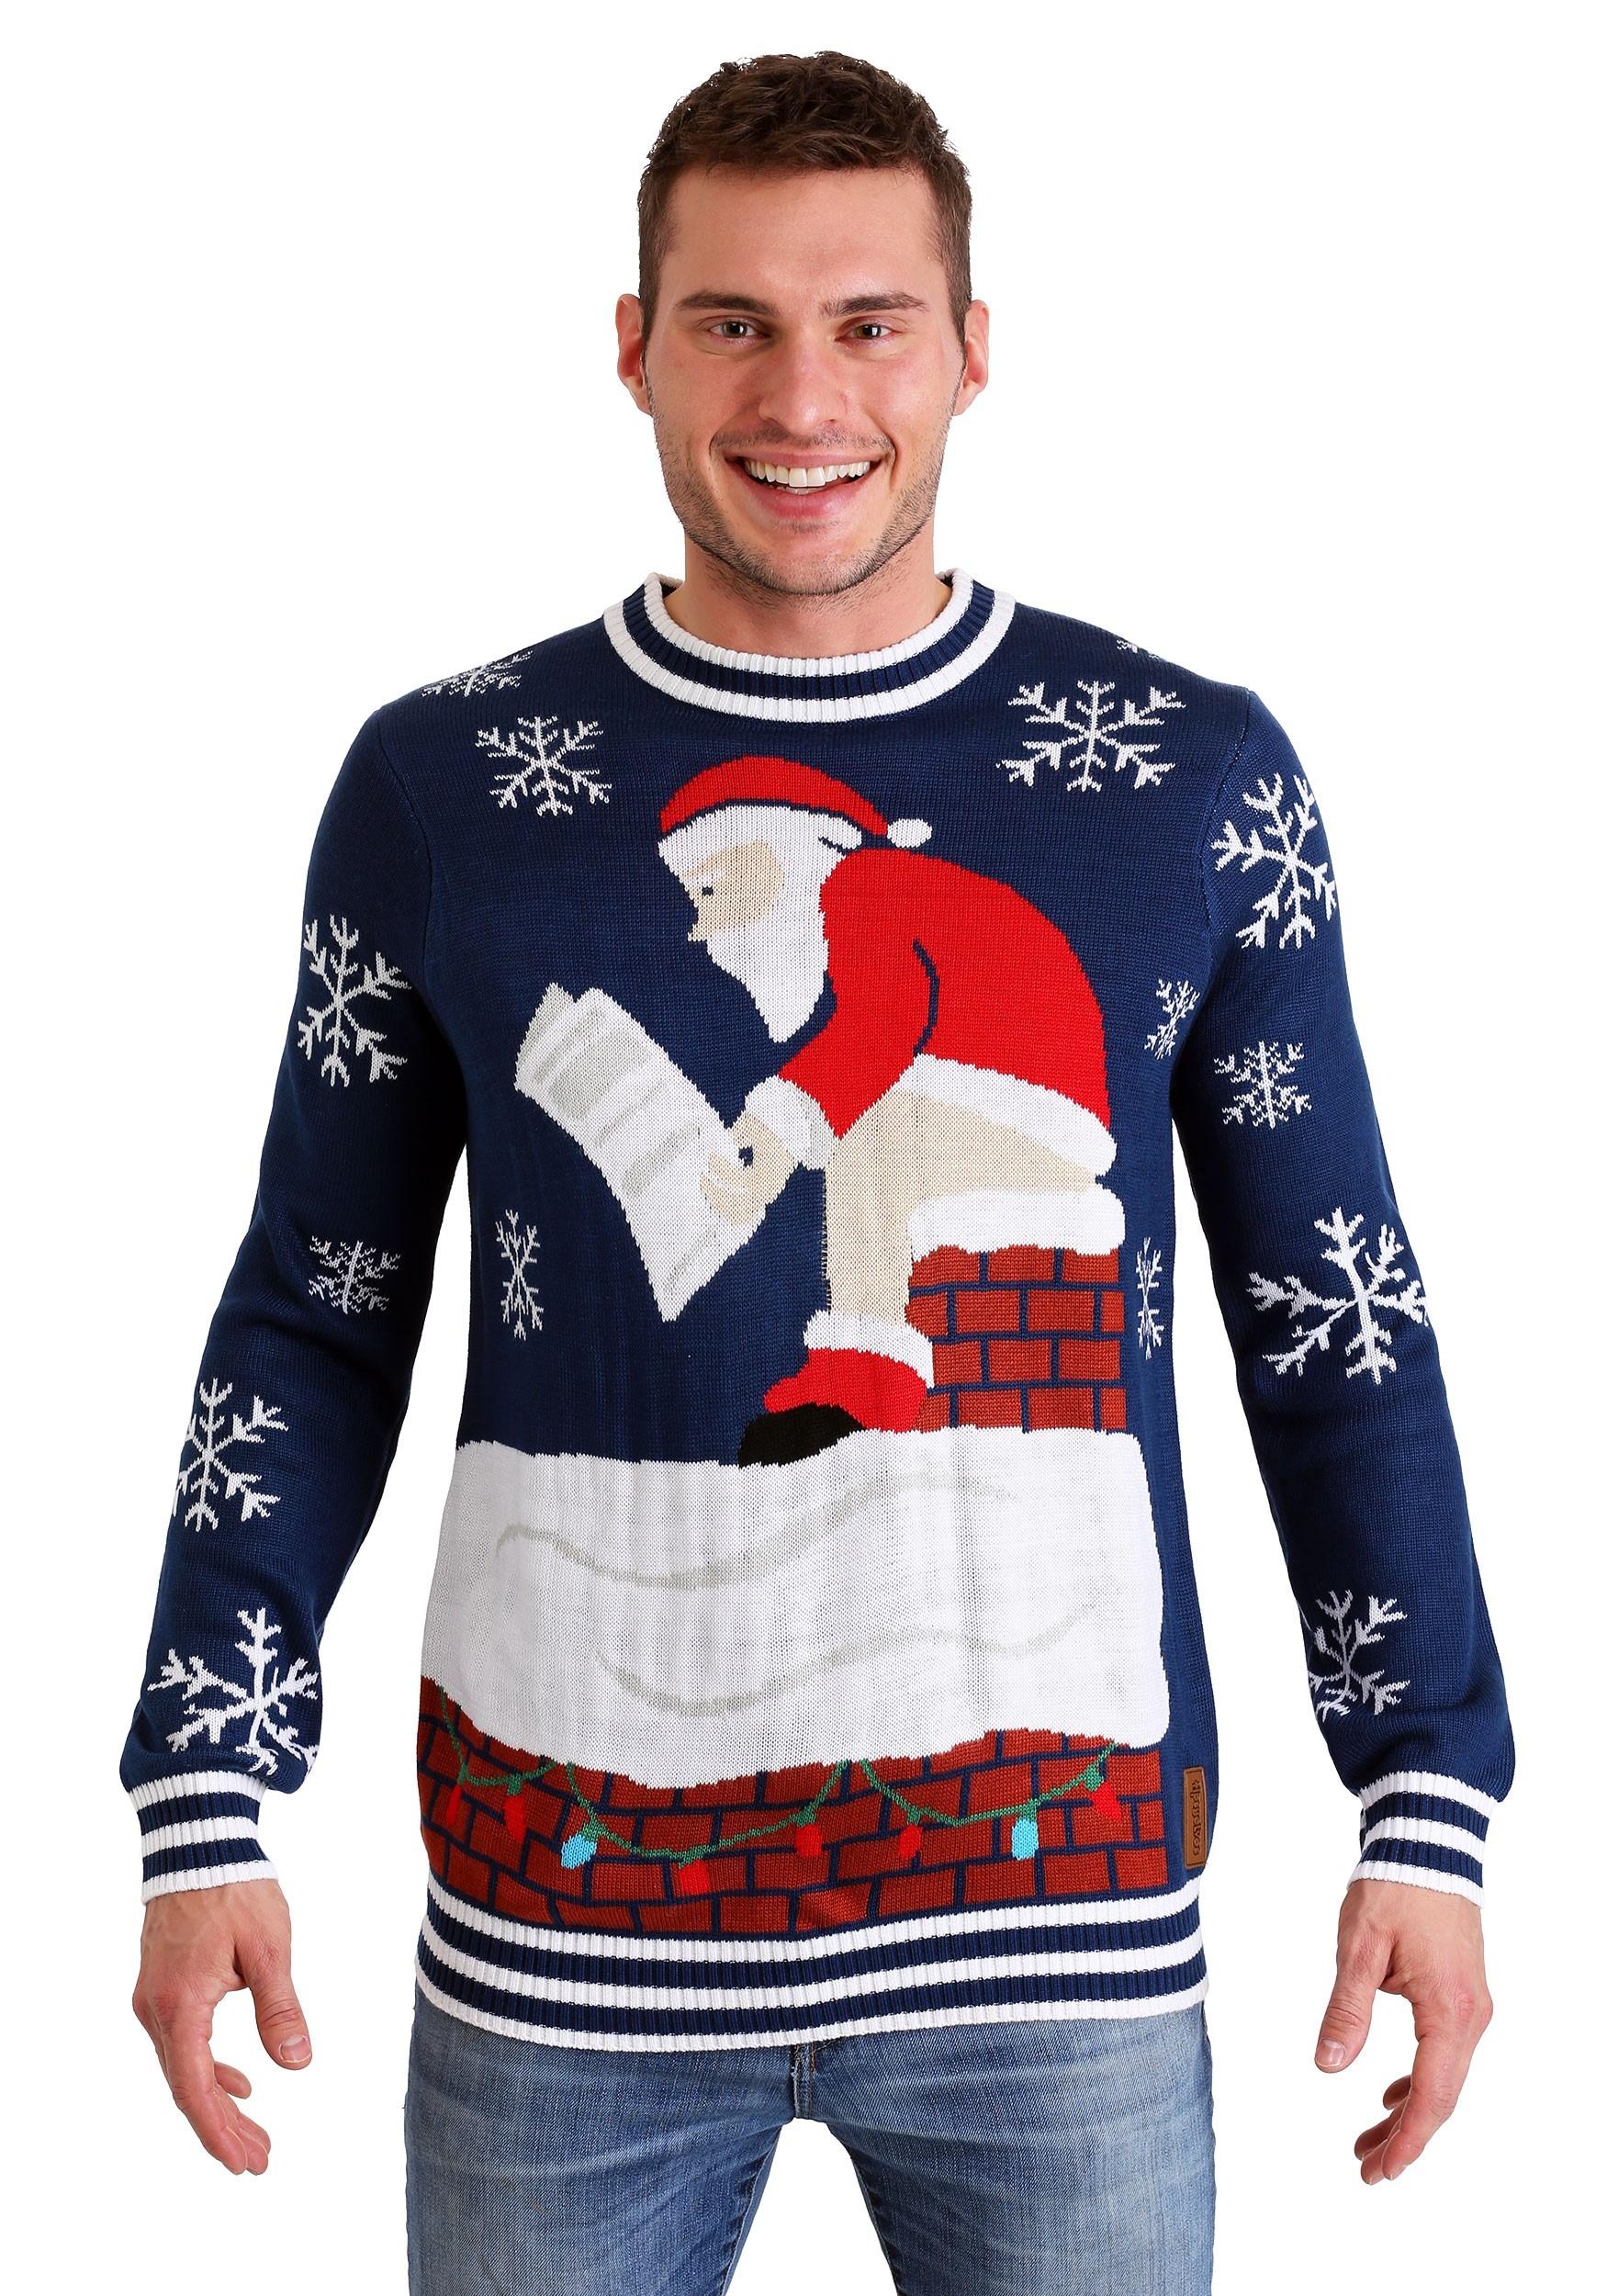 b901fa5ed Tipsy Elves Roof Santa Ugly Christmas Sweater